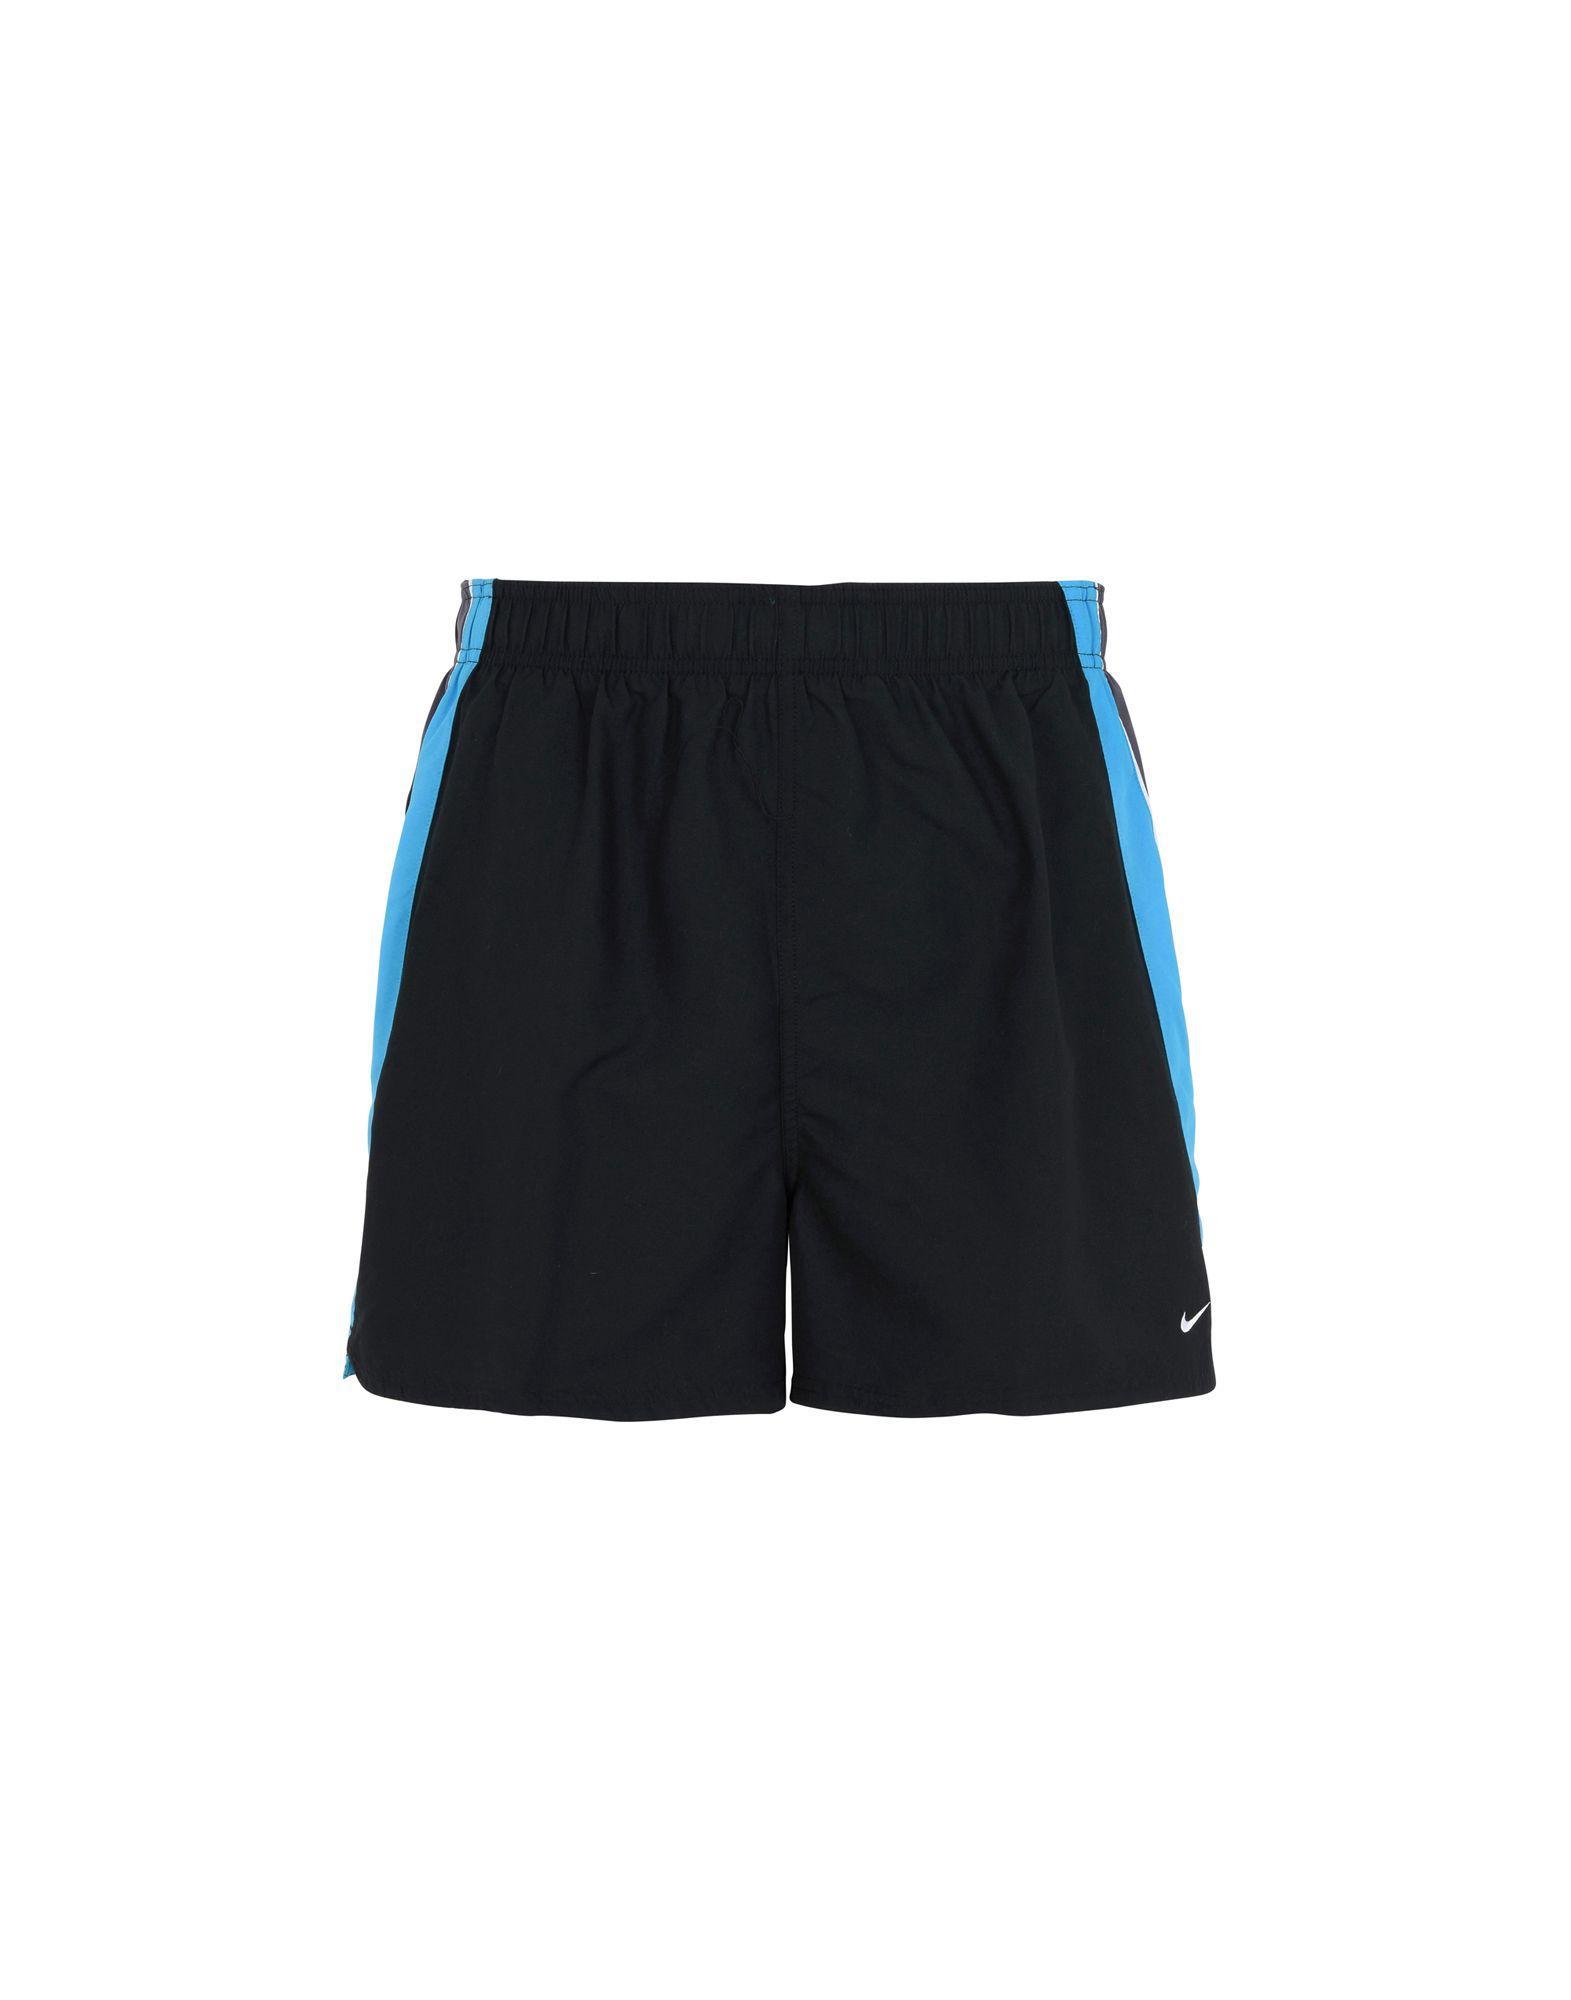 Nike Swimwear And Surfwear In Black